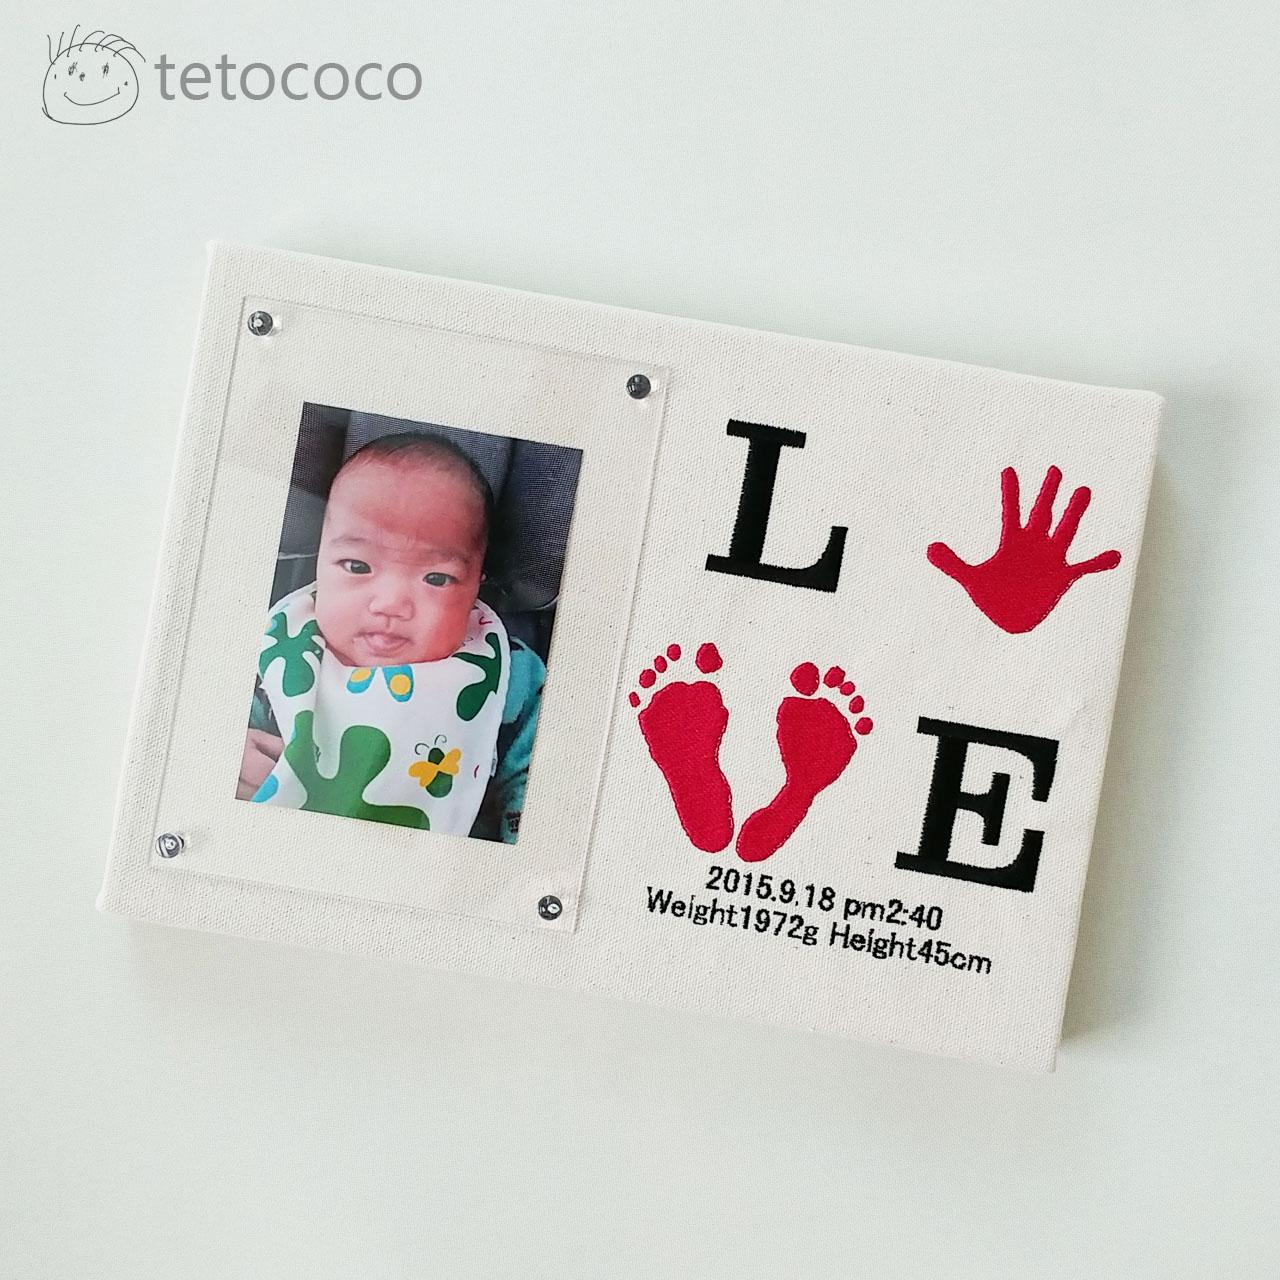 【tetococo】出産祝いと似顔絵刺繍のギフトショップ